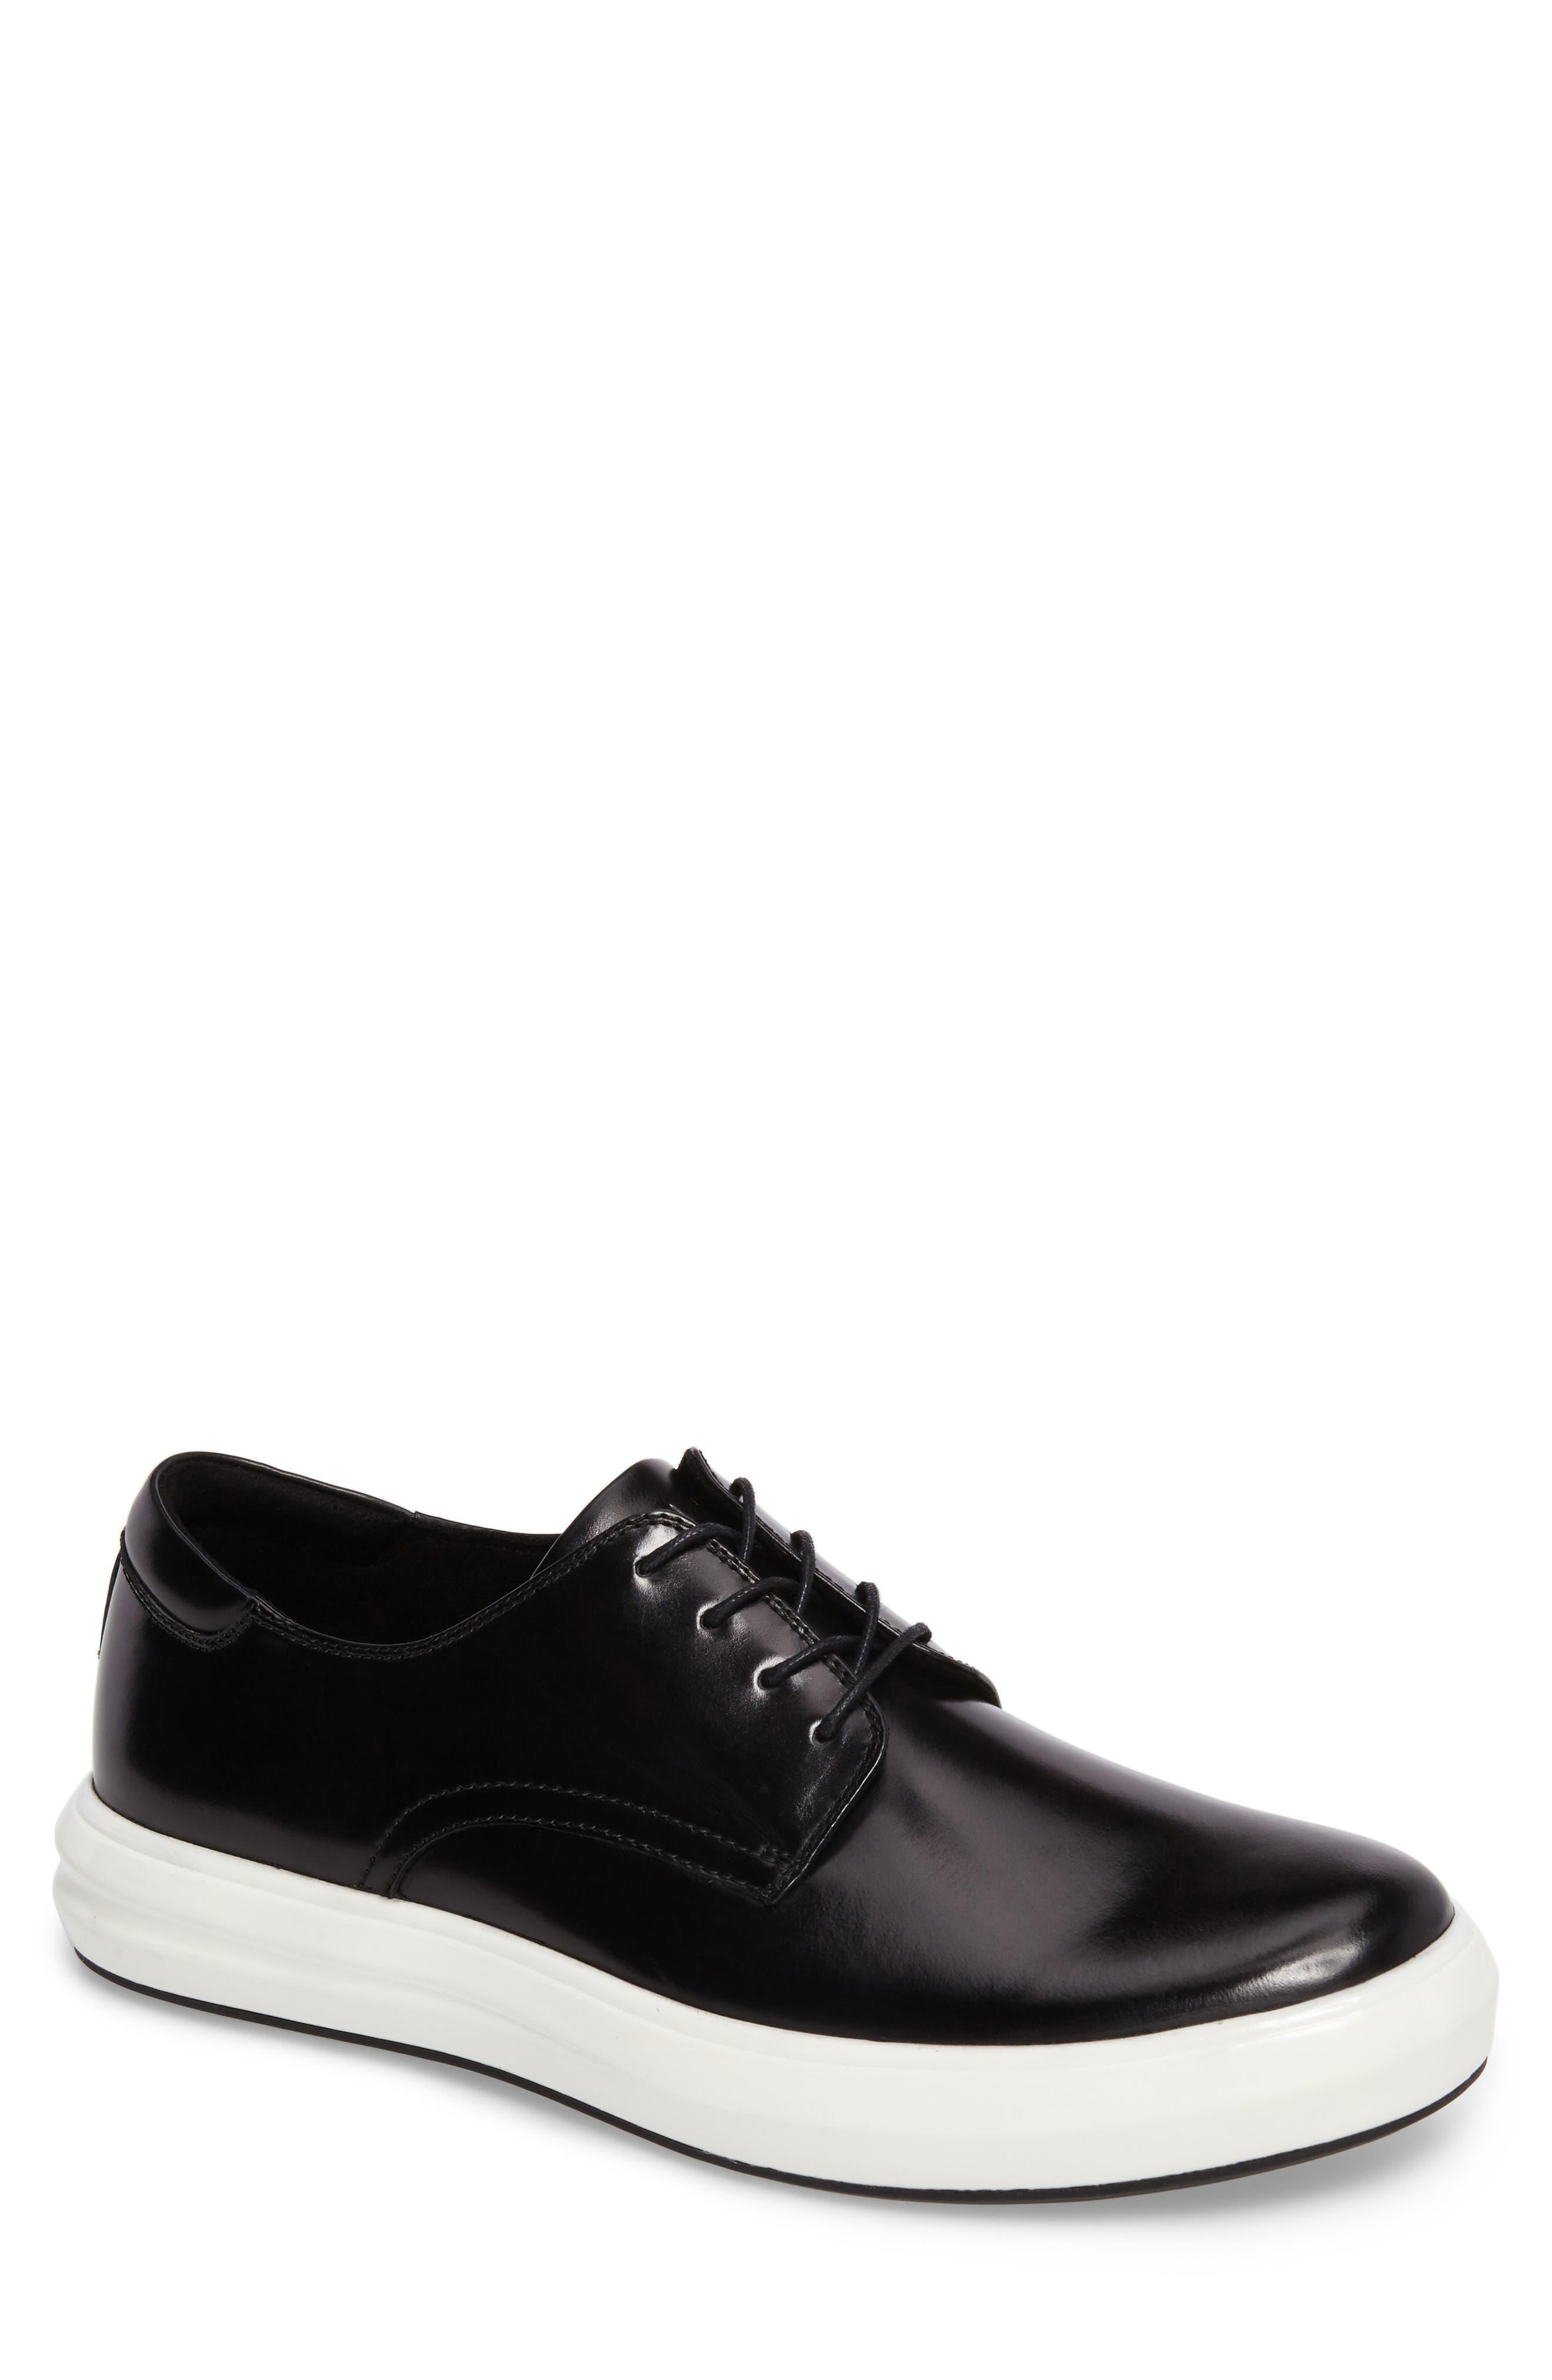 Kenneth Cole New York Sneaker (Men)